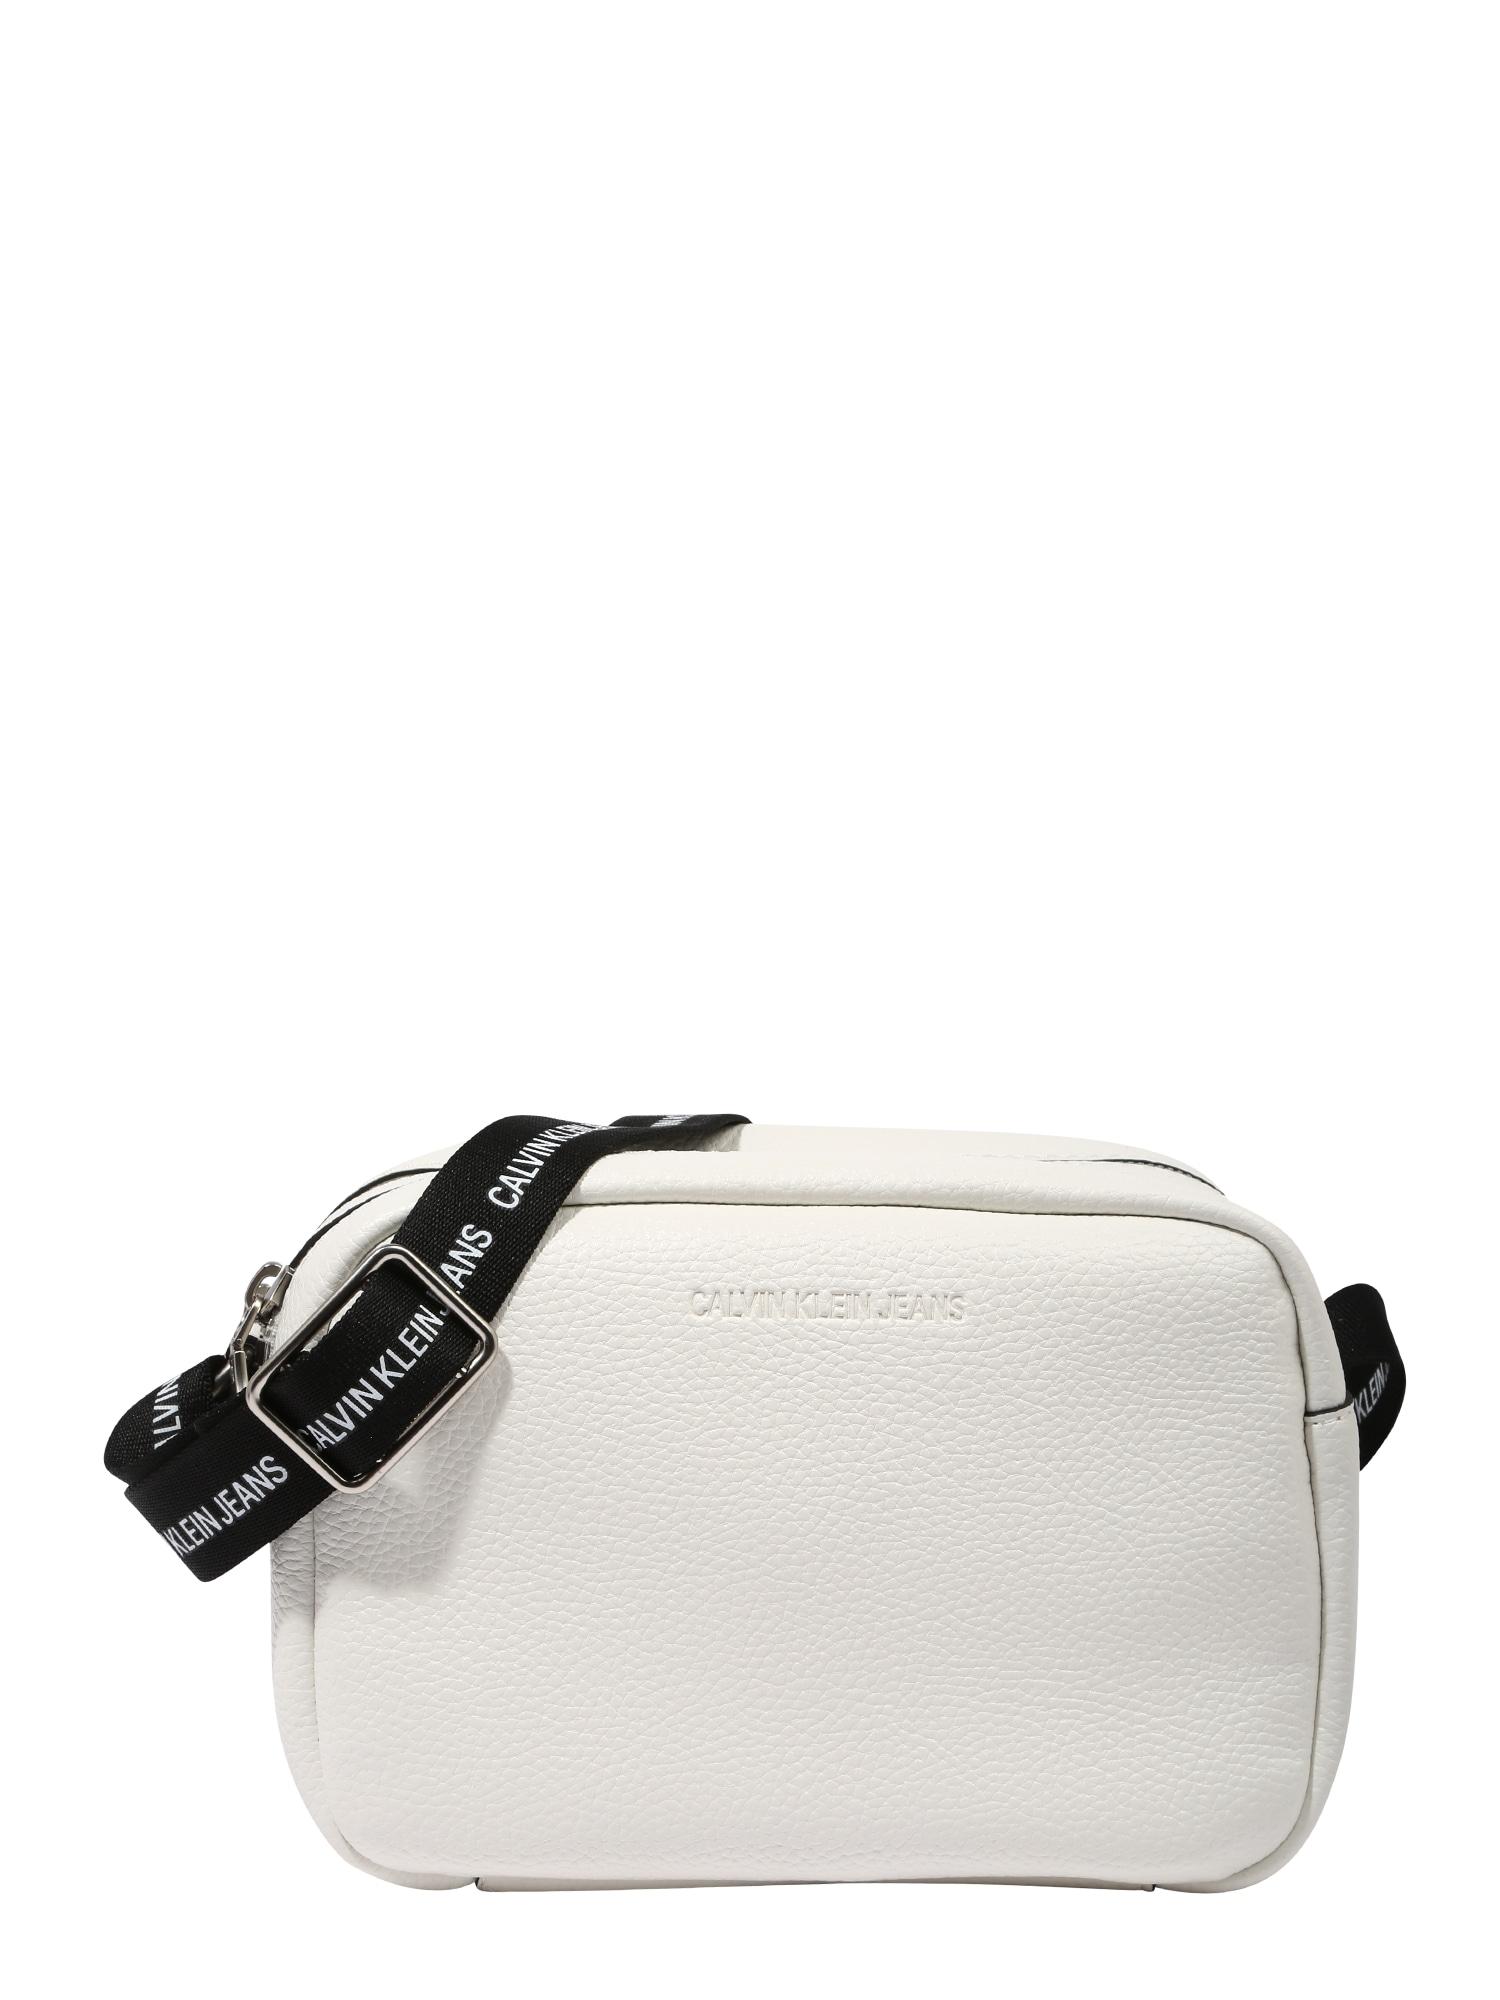 Calvin Klein Jeans Rankinė su ilgu dirželiu balta / juoda